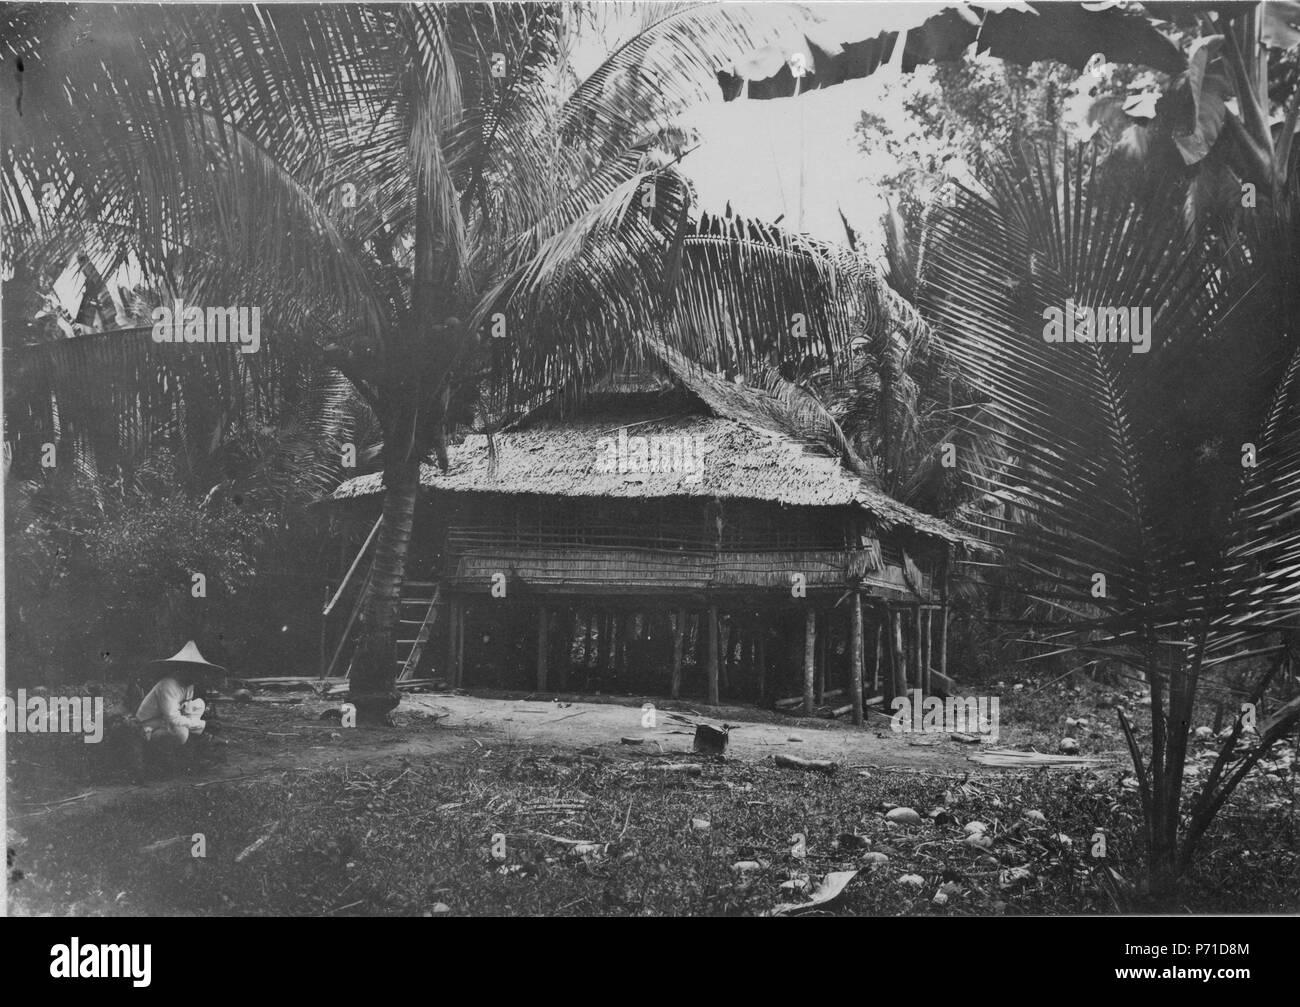 31 Hydda nära Bwool. Sulawesi. Indonesien - SMVK - 010670 - Stock Image